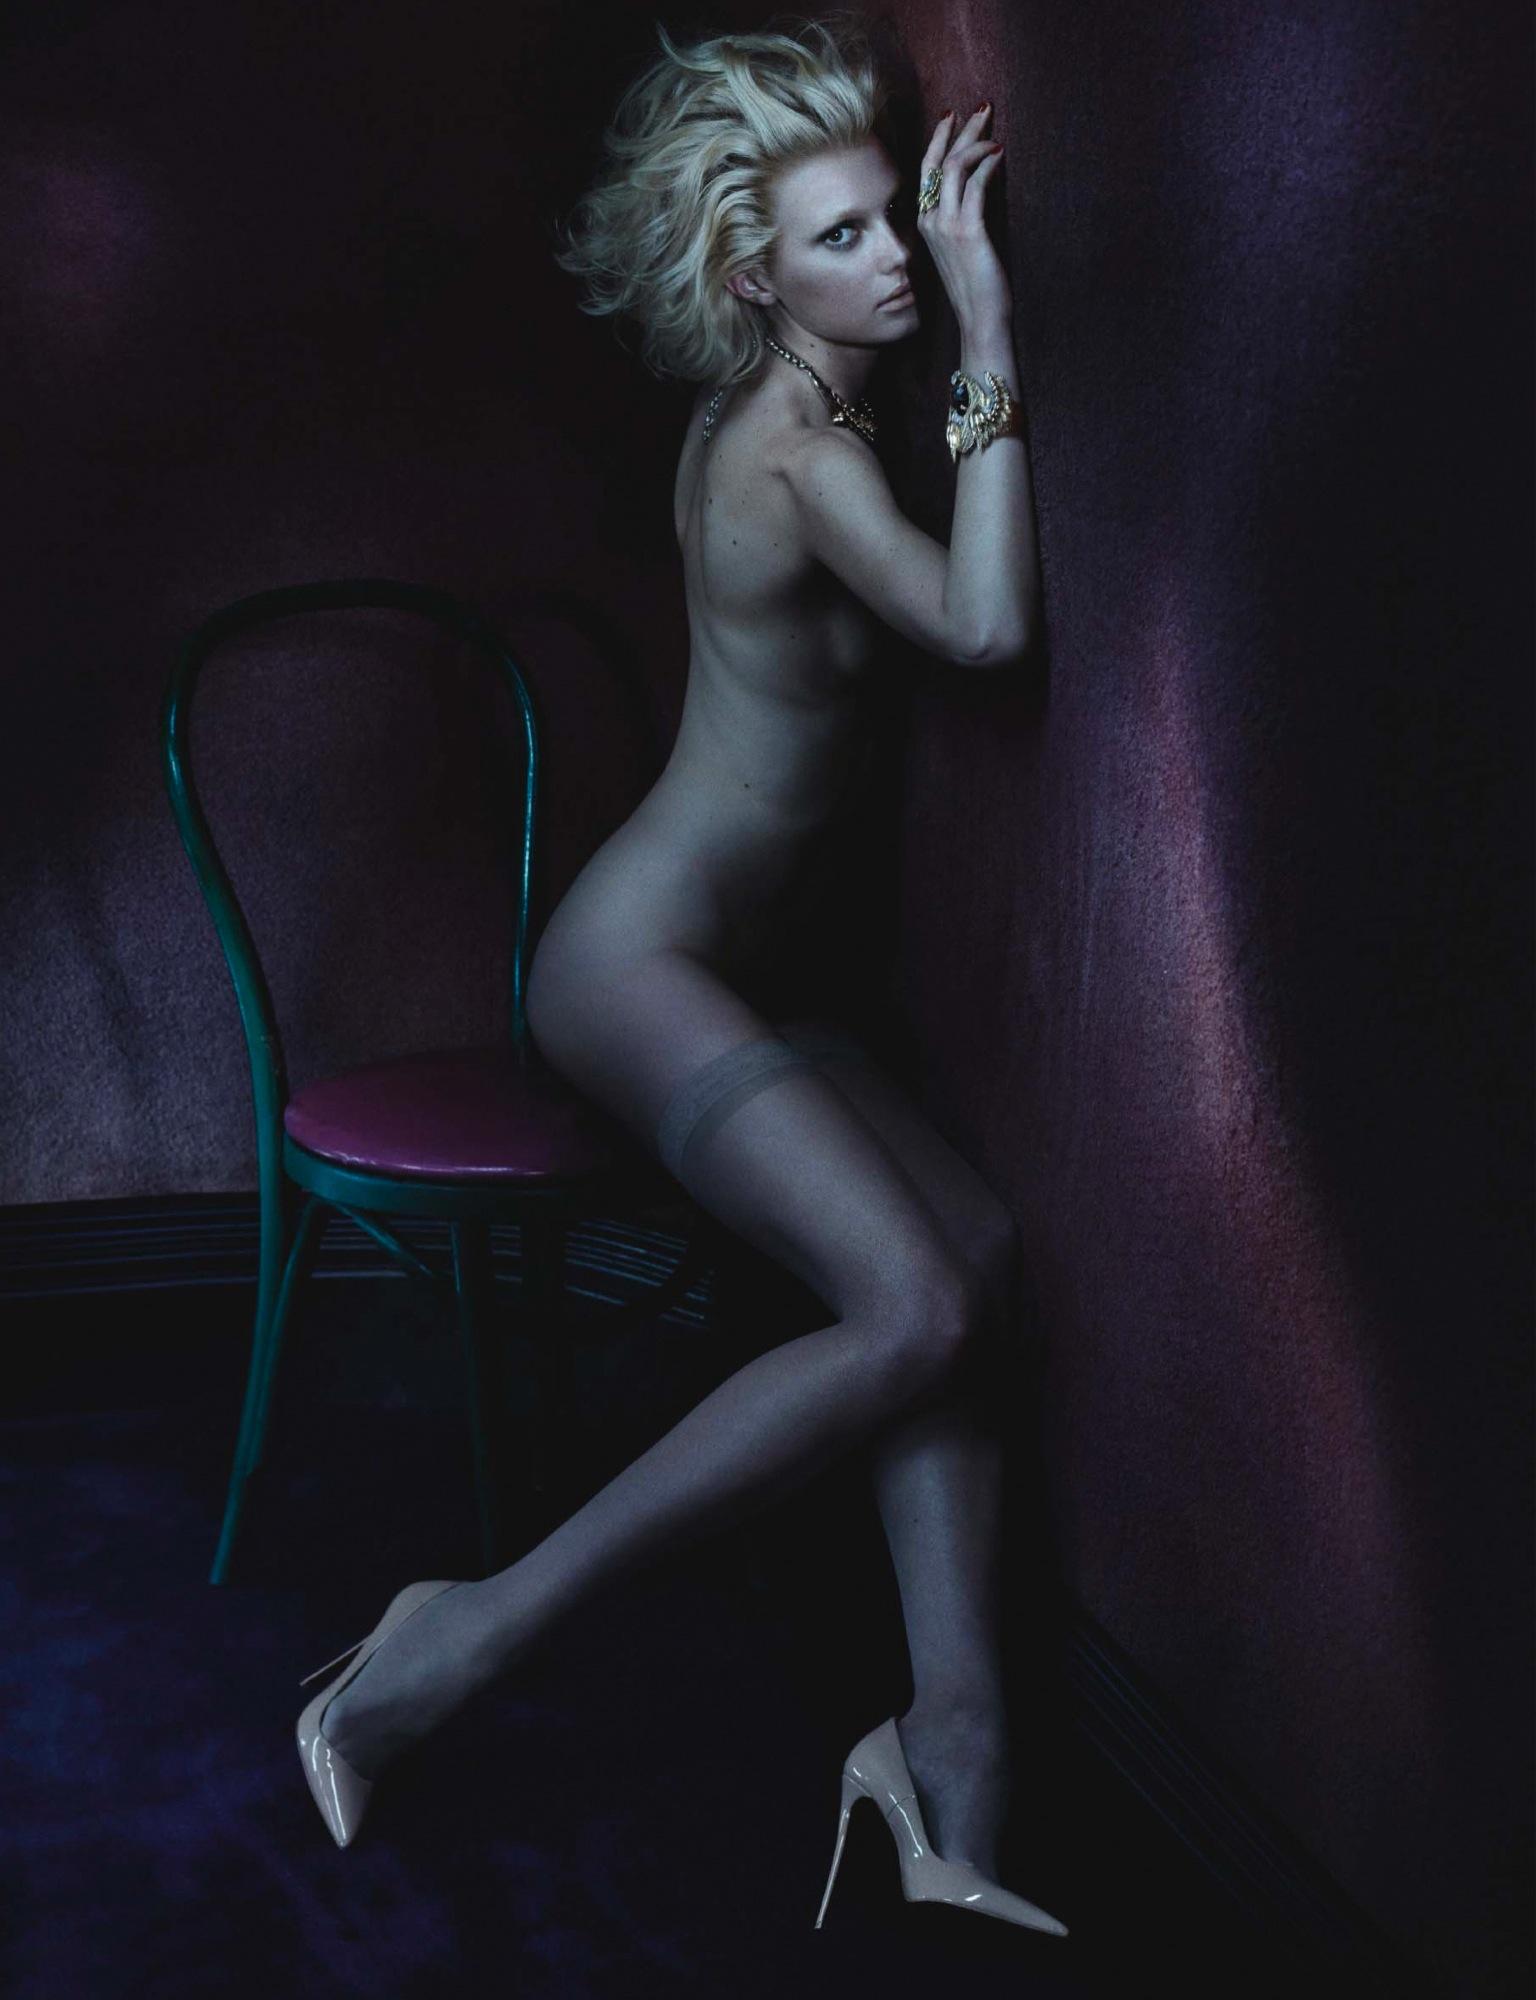 Sigrid_Agren-Benjamin_Lennox-Numéro-01-wearesodroee.jpeg